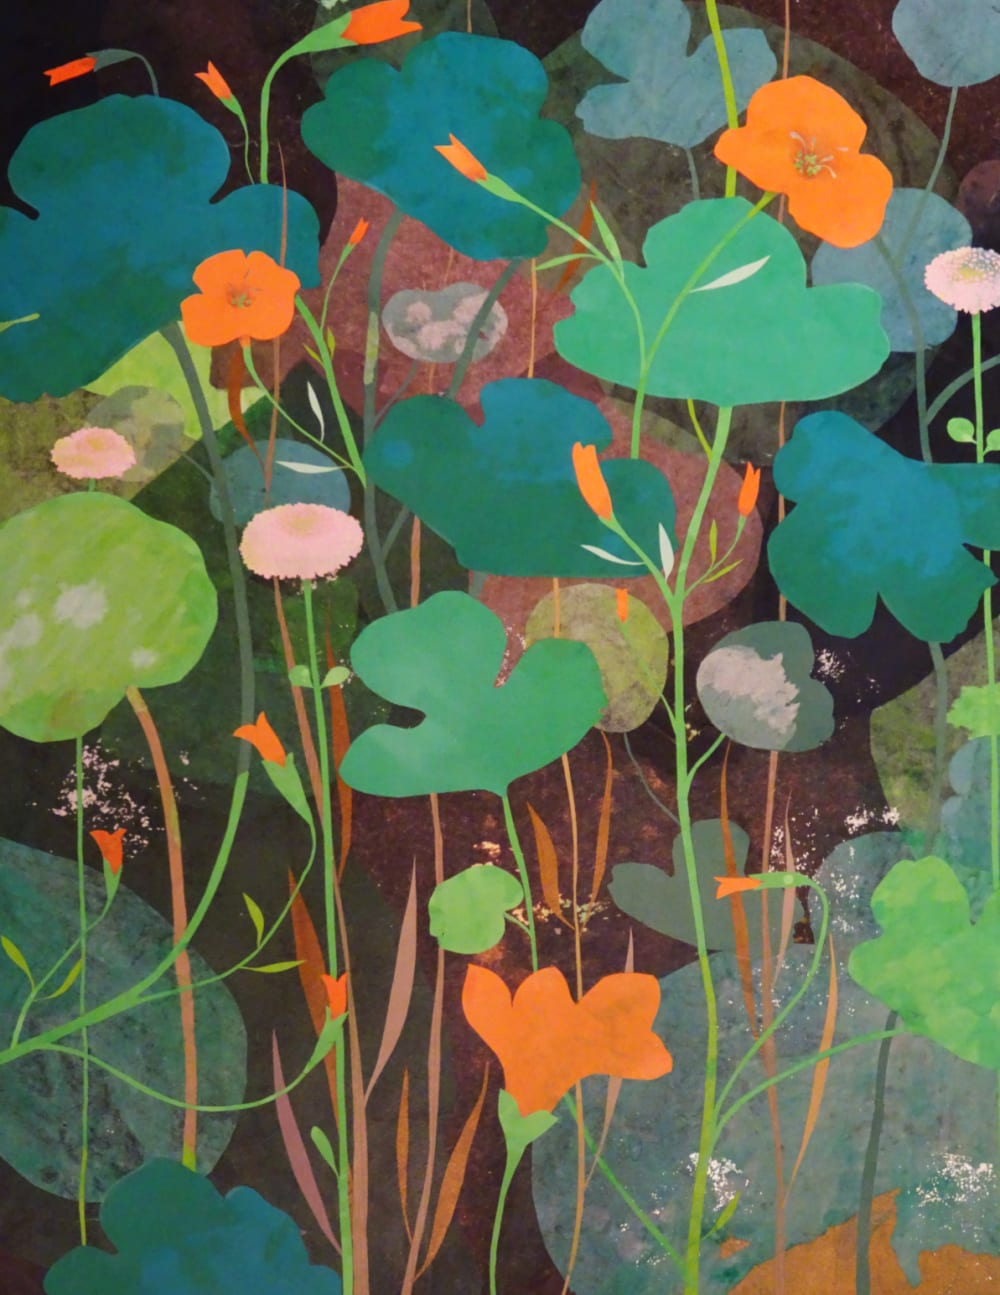 Les capucines  - Karine Daisay